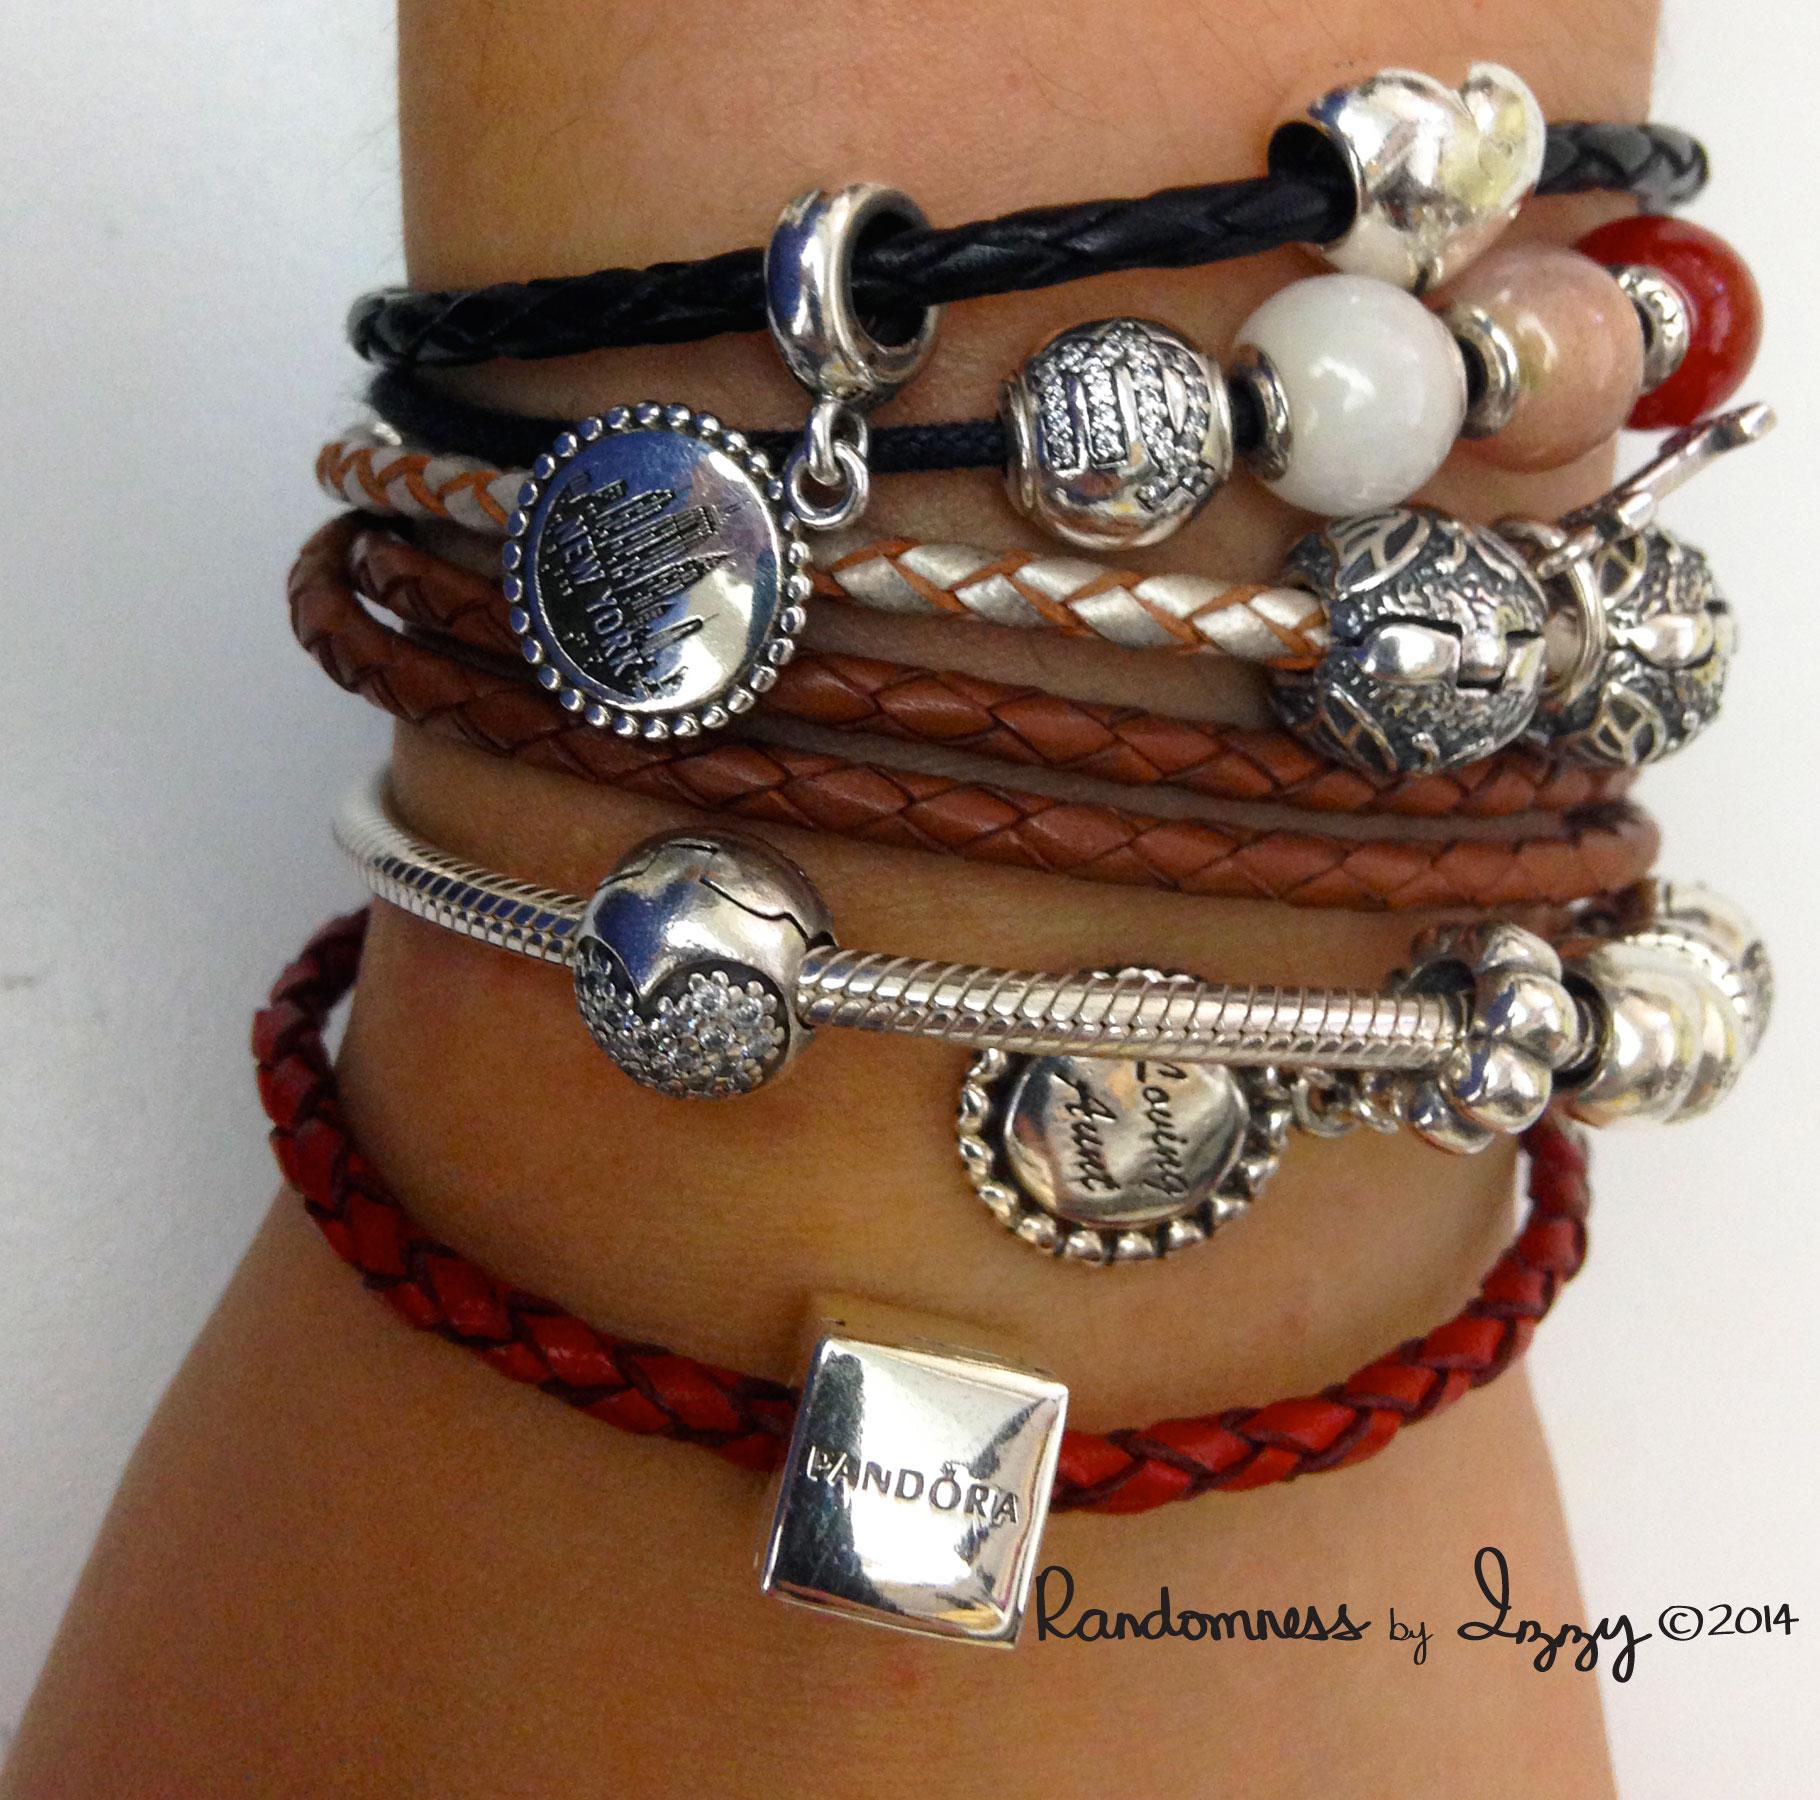 f3ba2f175 purchase double black leather pandora bracelet with charms 34c24 67a7e; get pandora  bracelet 35 66bf8 277e2